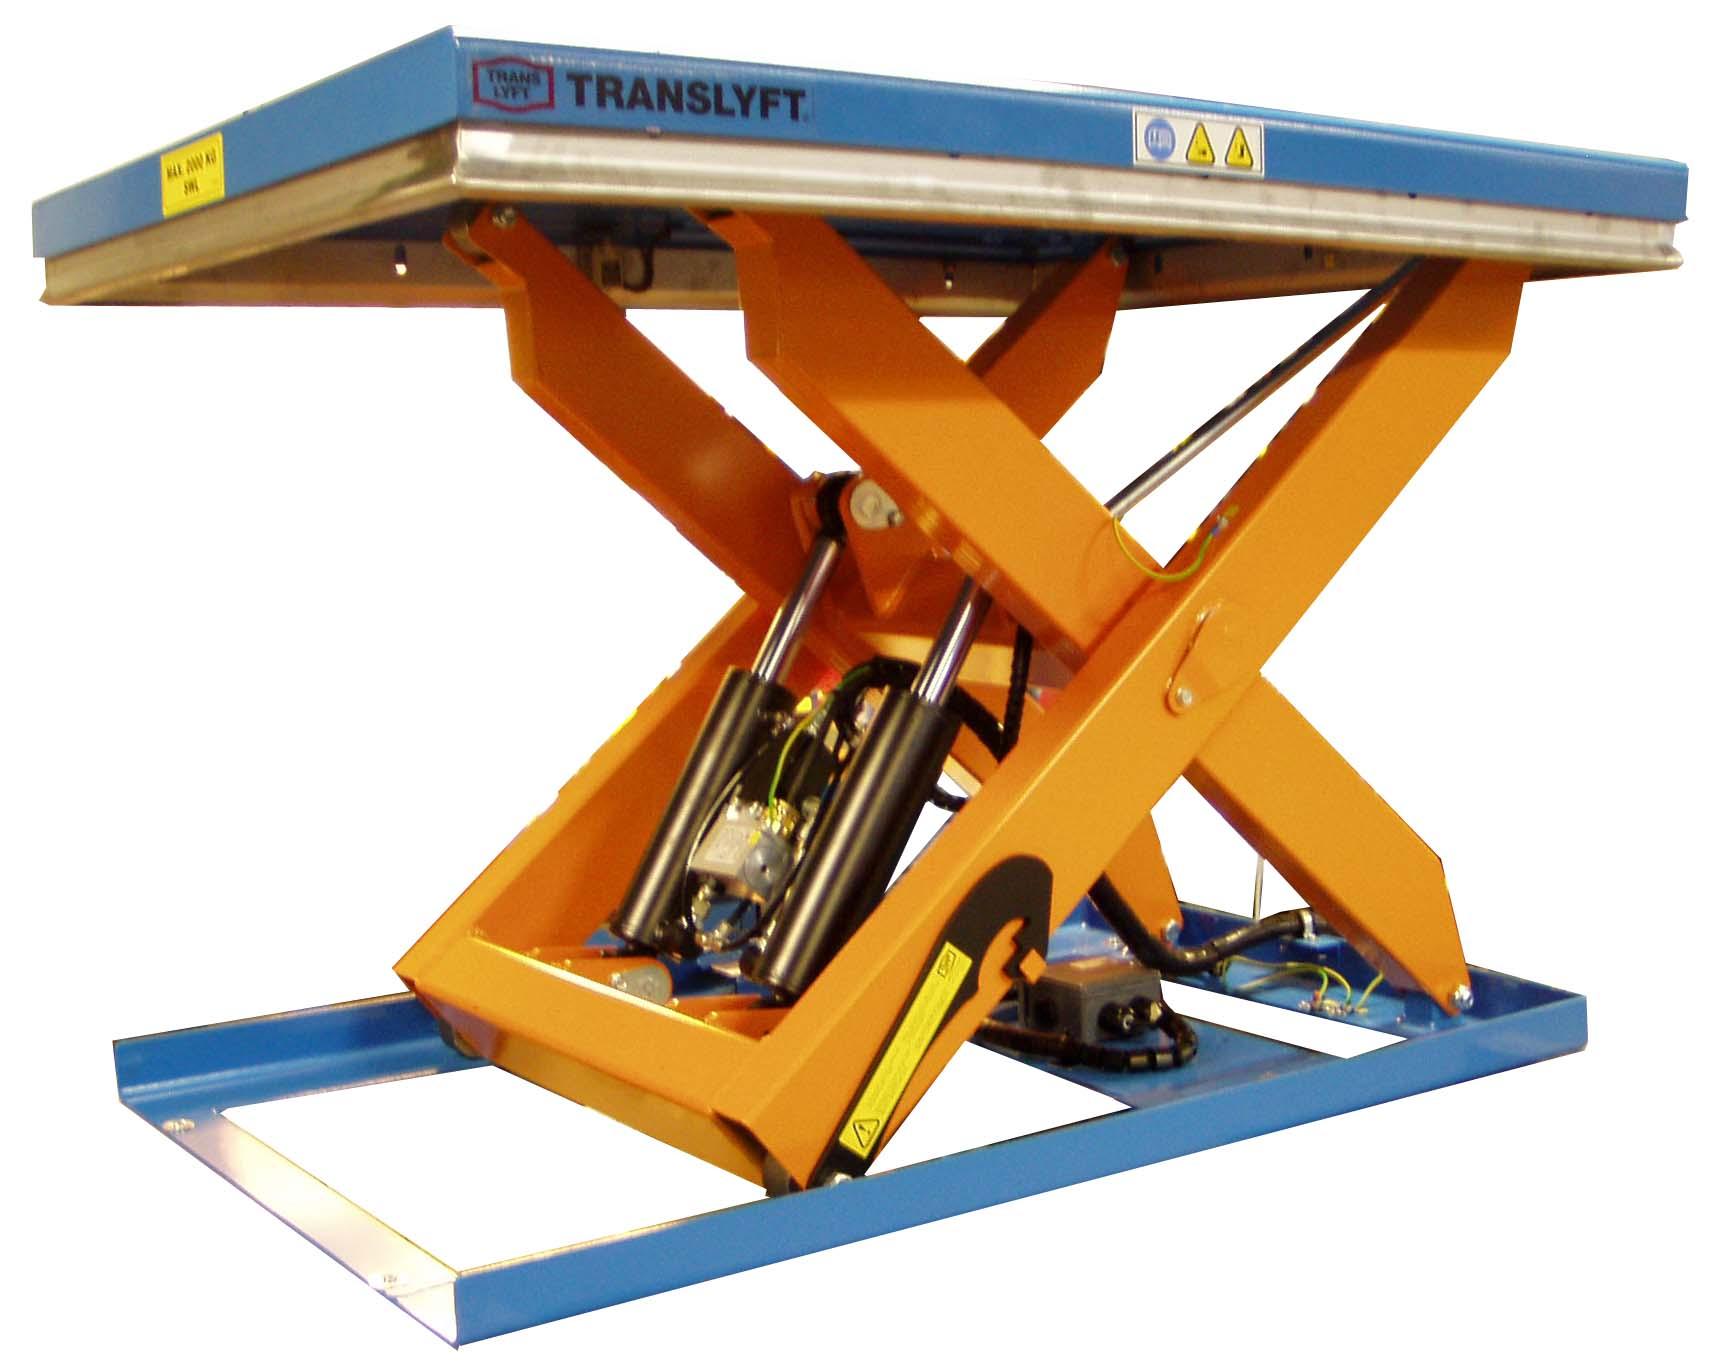 ATEX Løfteborde fra TRANSLYFT ERGO A/S - Metal Supply DK